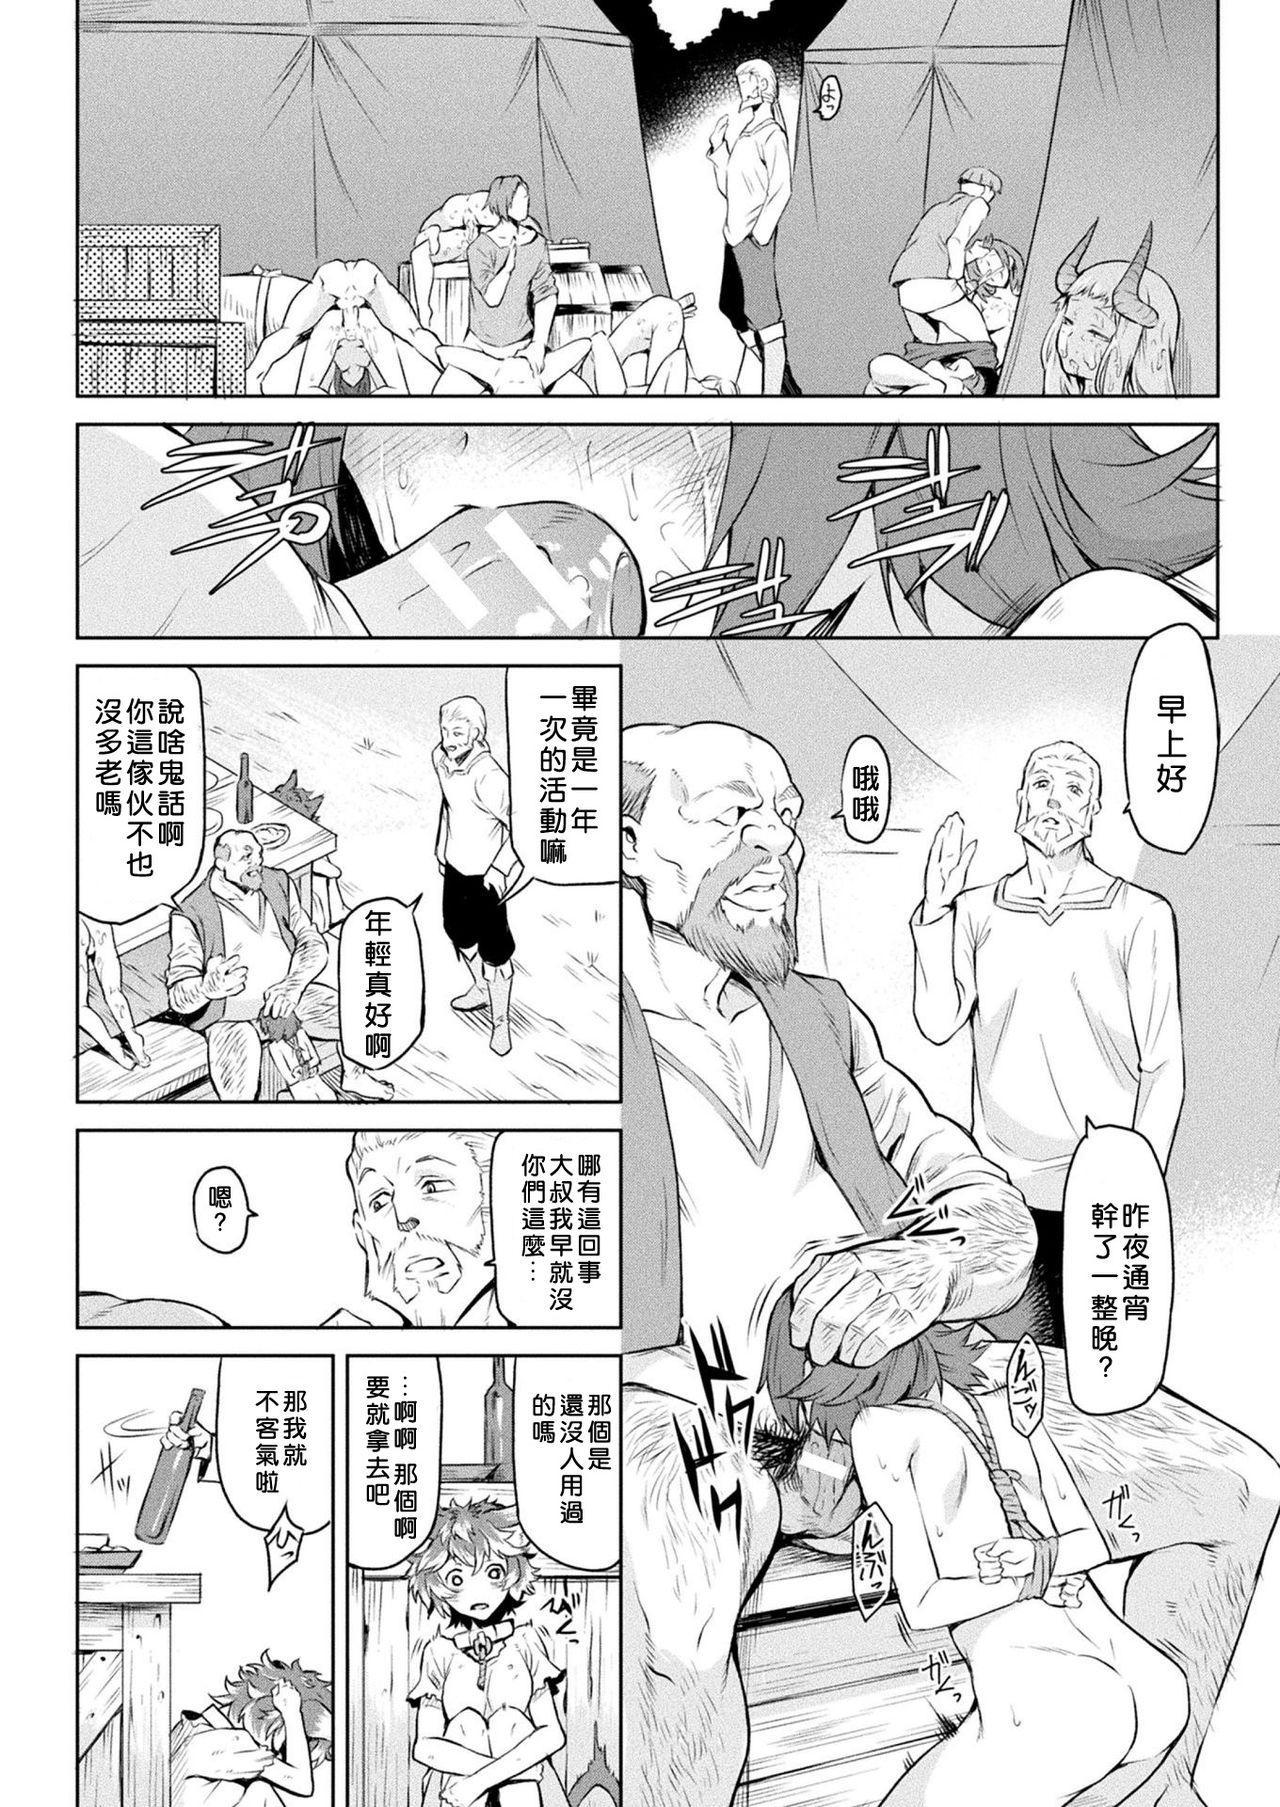 Kisei-jyu 31